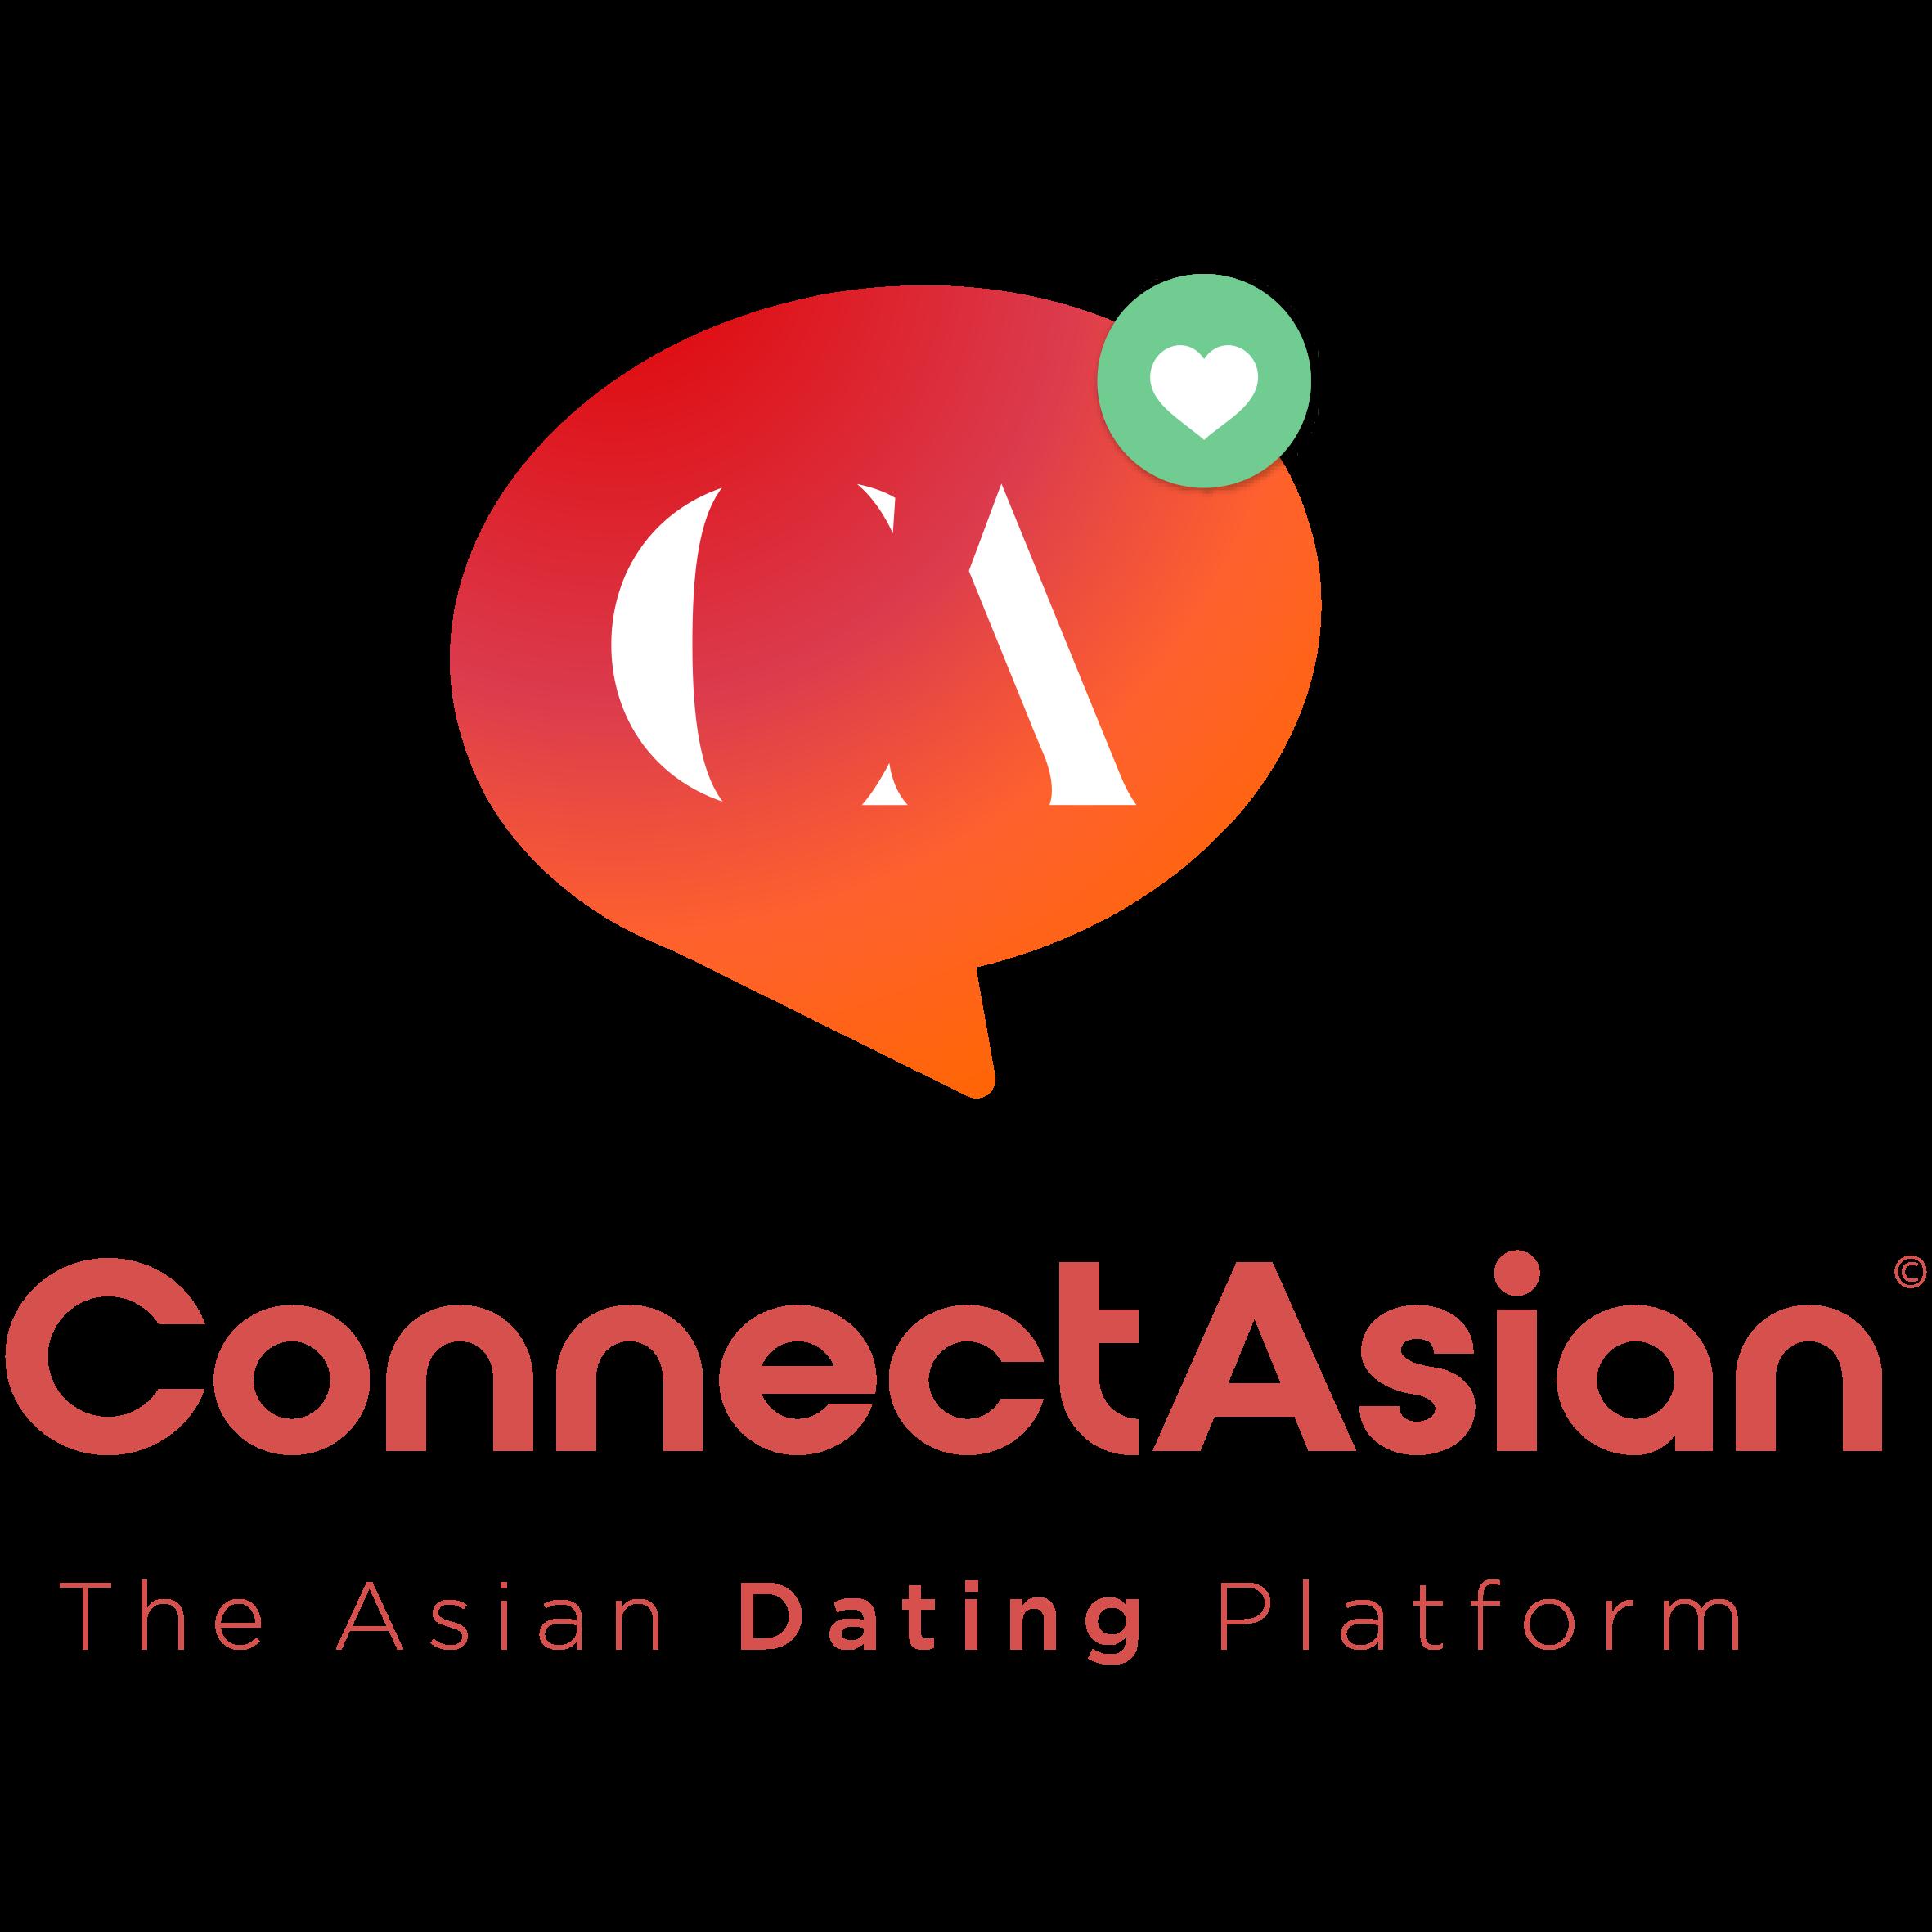 ConnectAsian